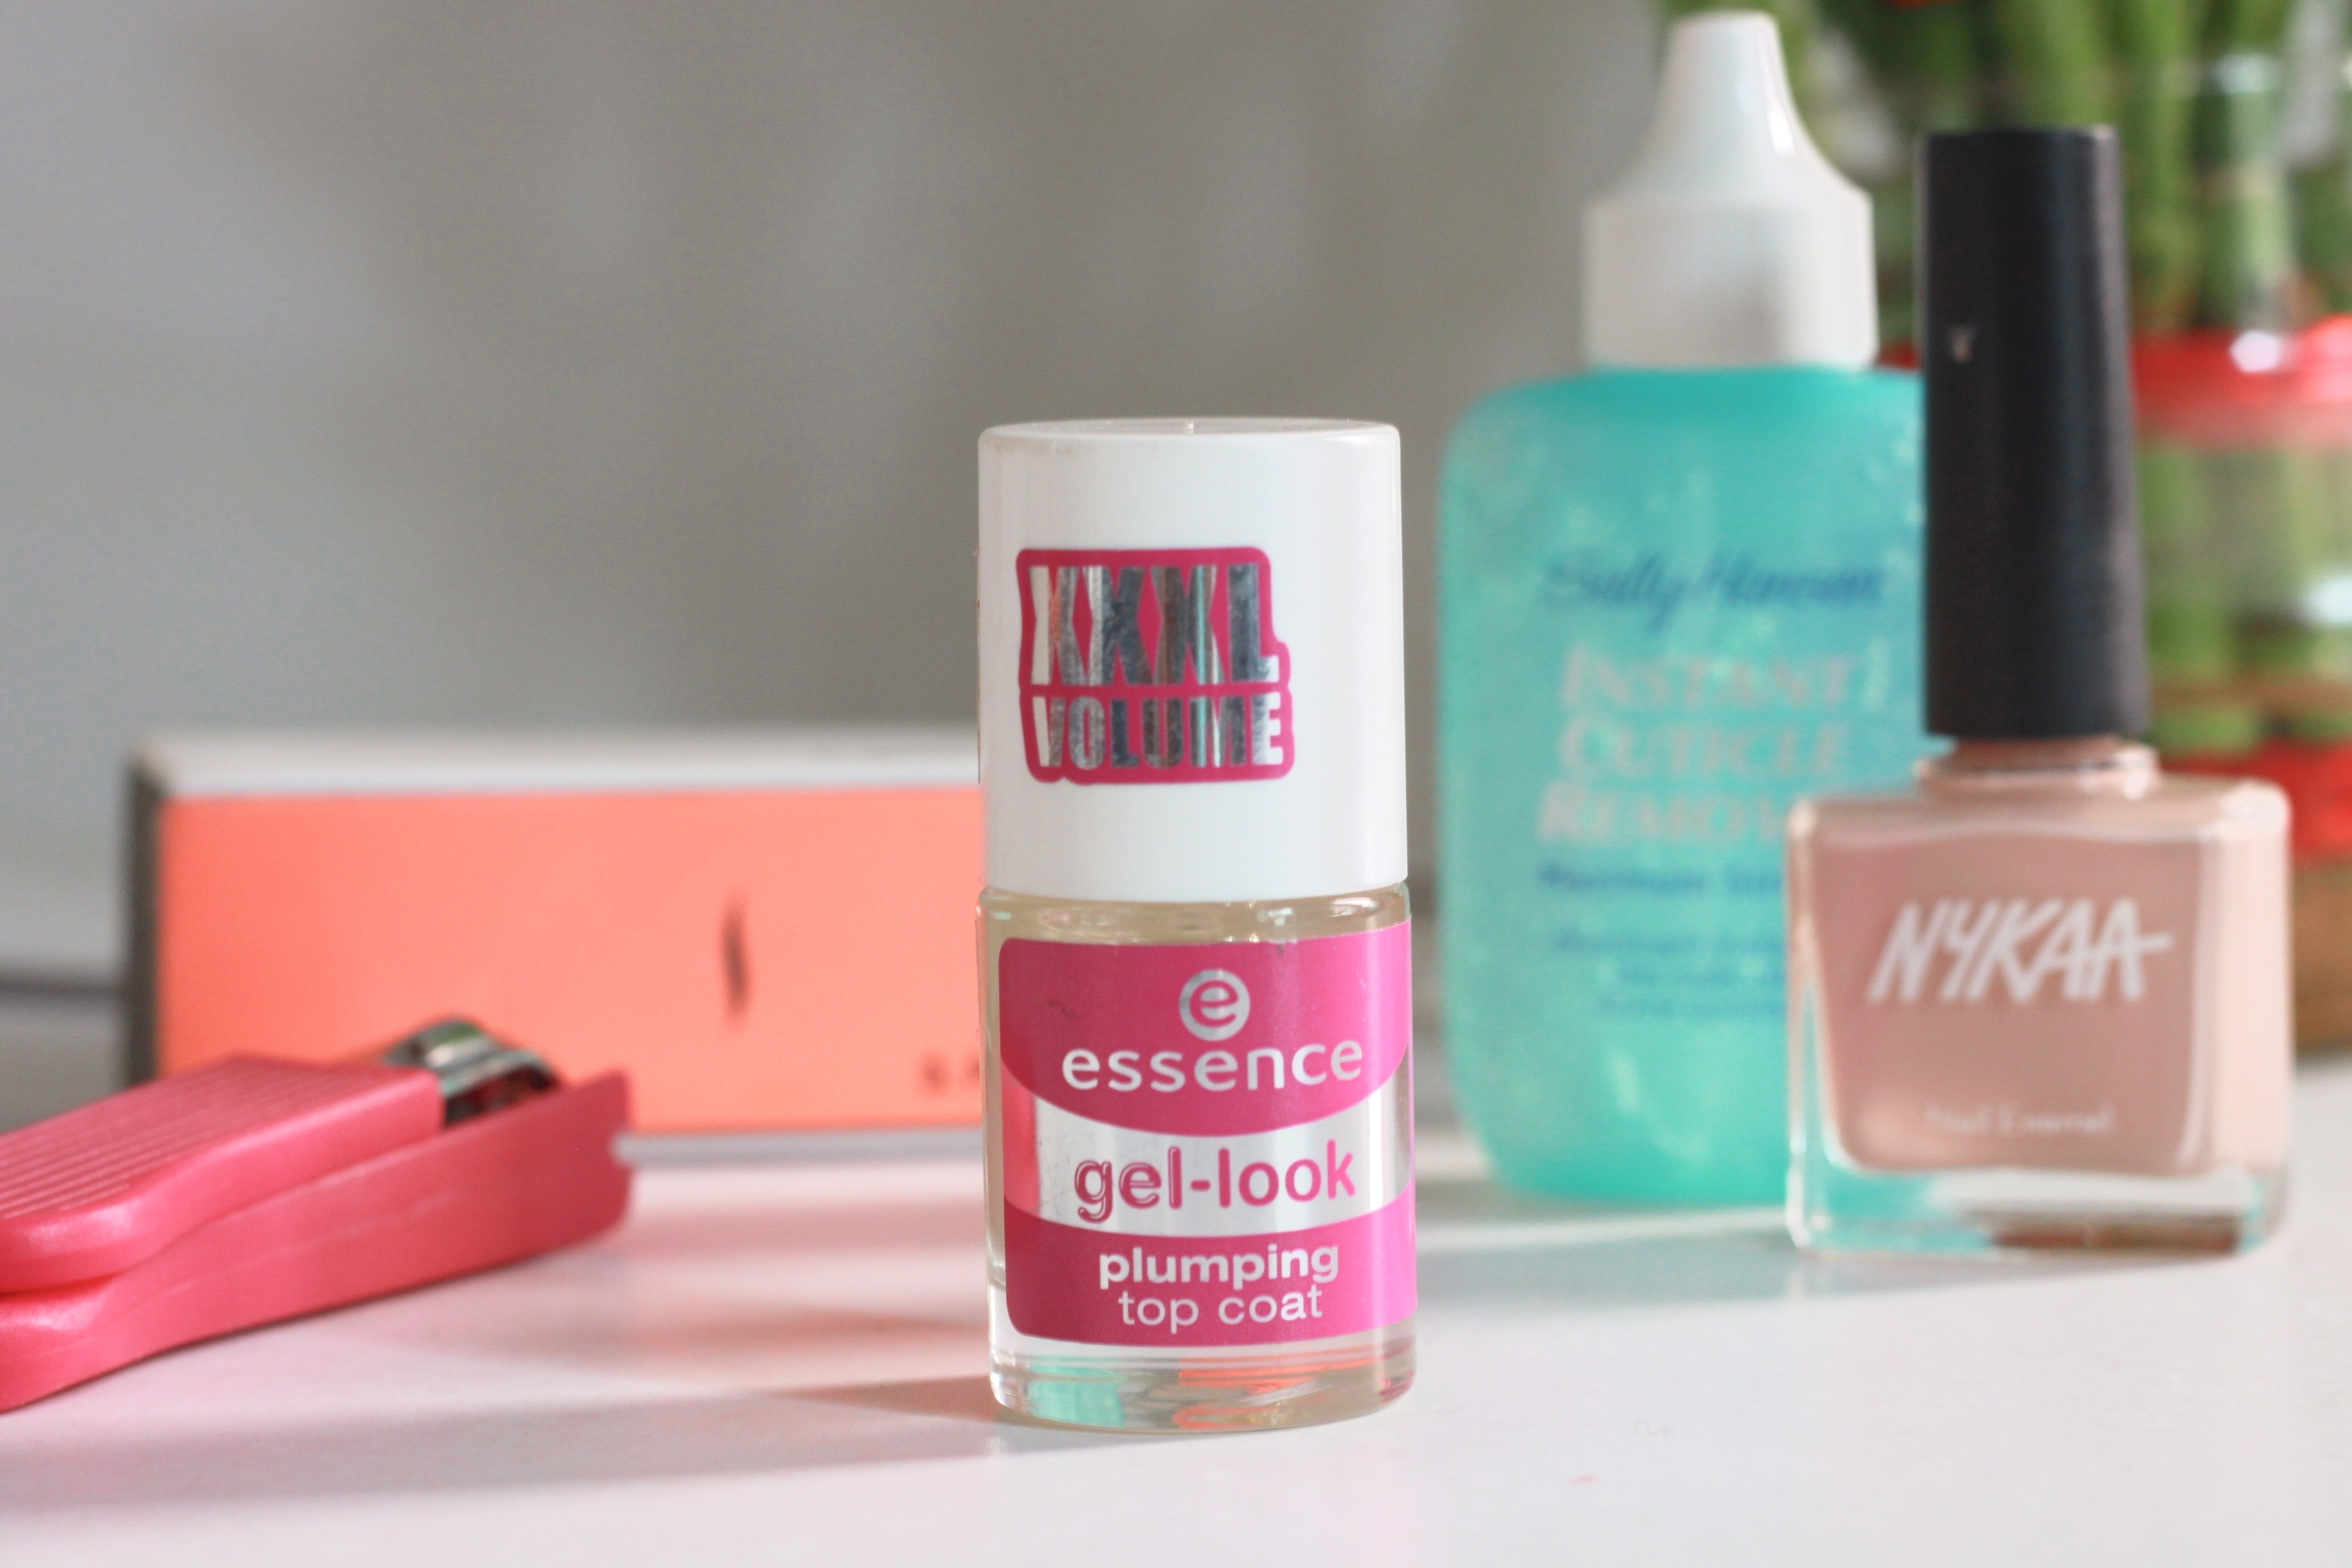 diy nails, diy manicure, at home manicure, manicure, cuticles, nykaa nail polish , sephora nail buffer, gel nails